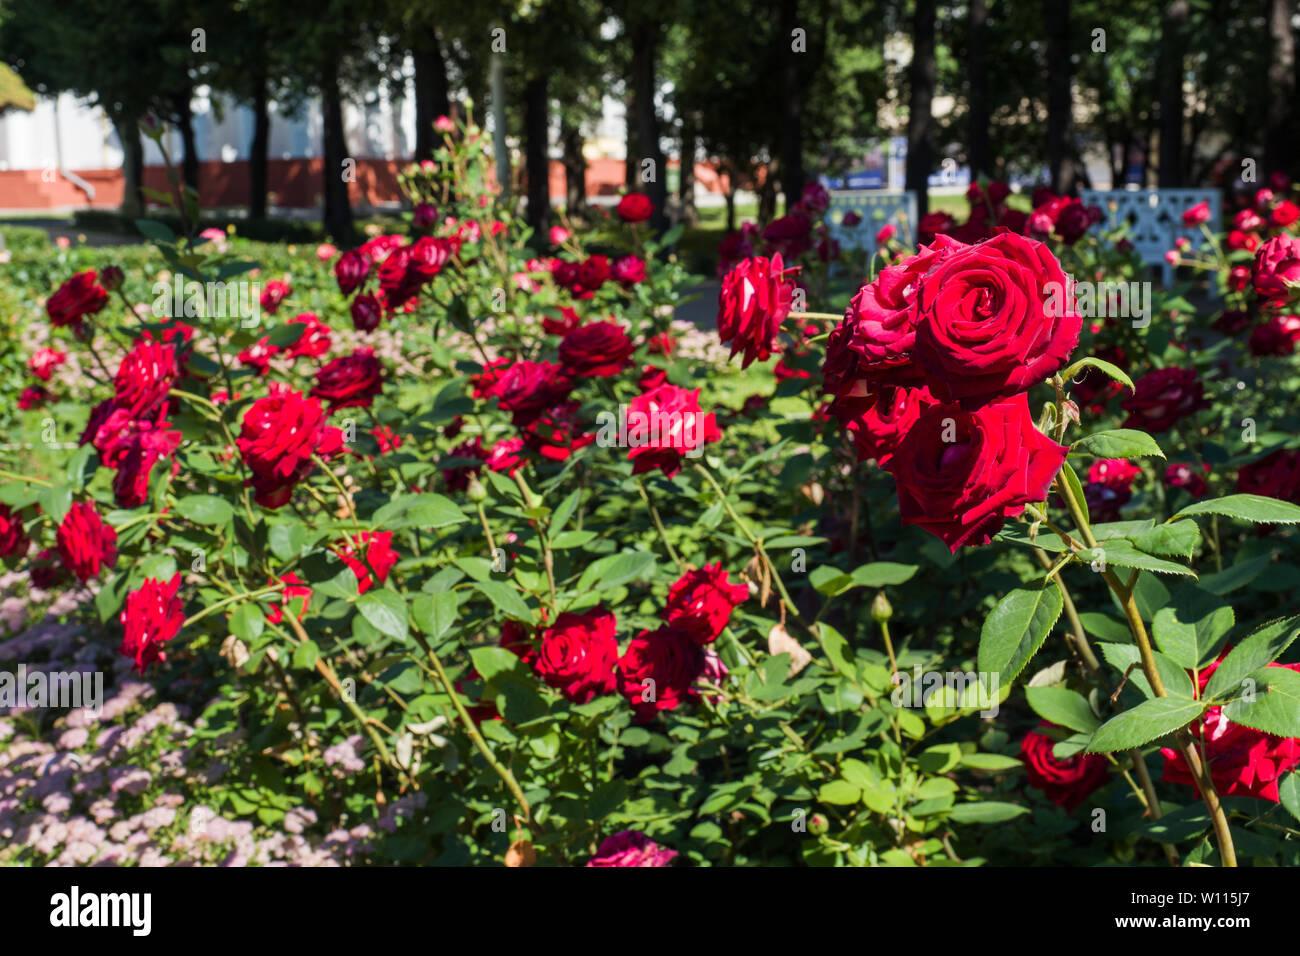 Flowering rose bushes in the summer garden - Stock Image